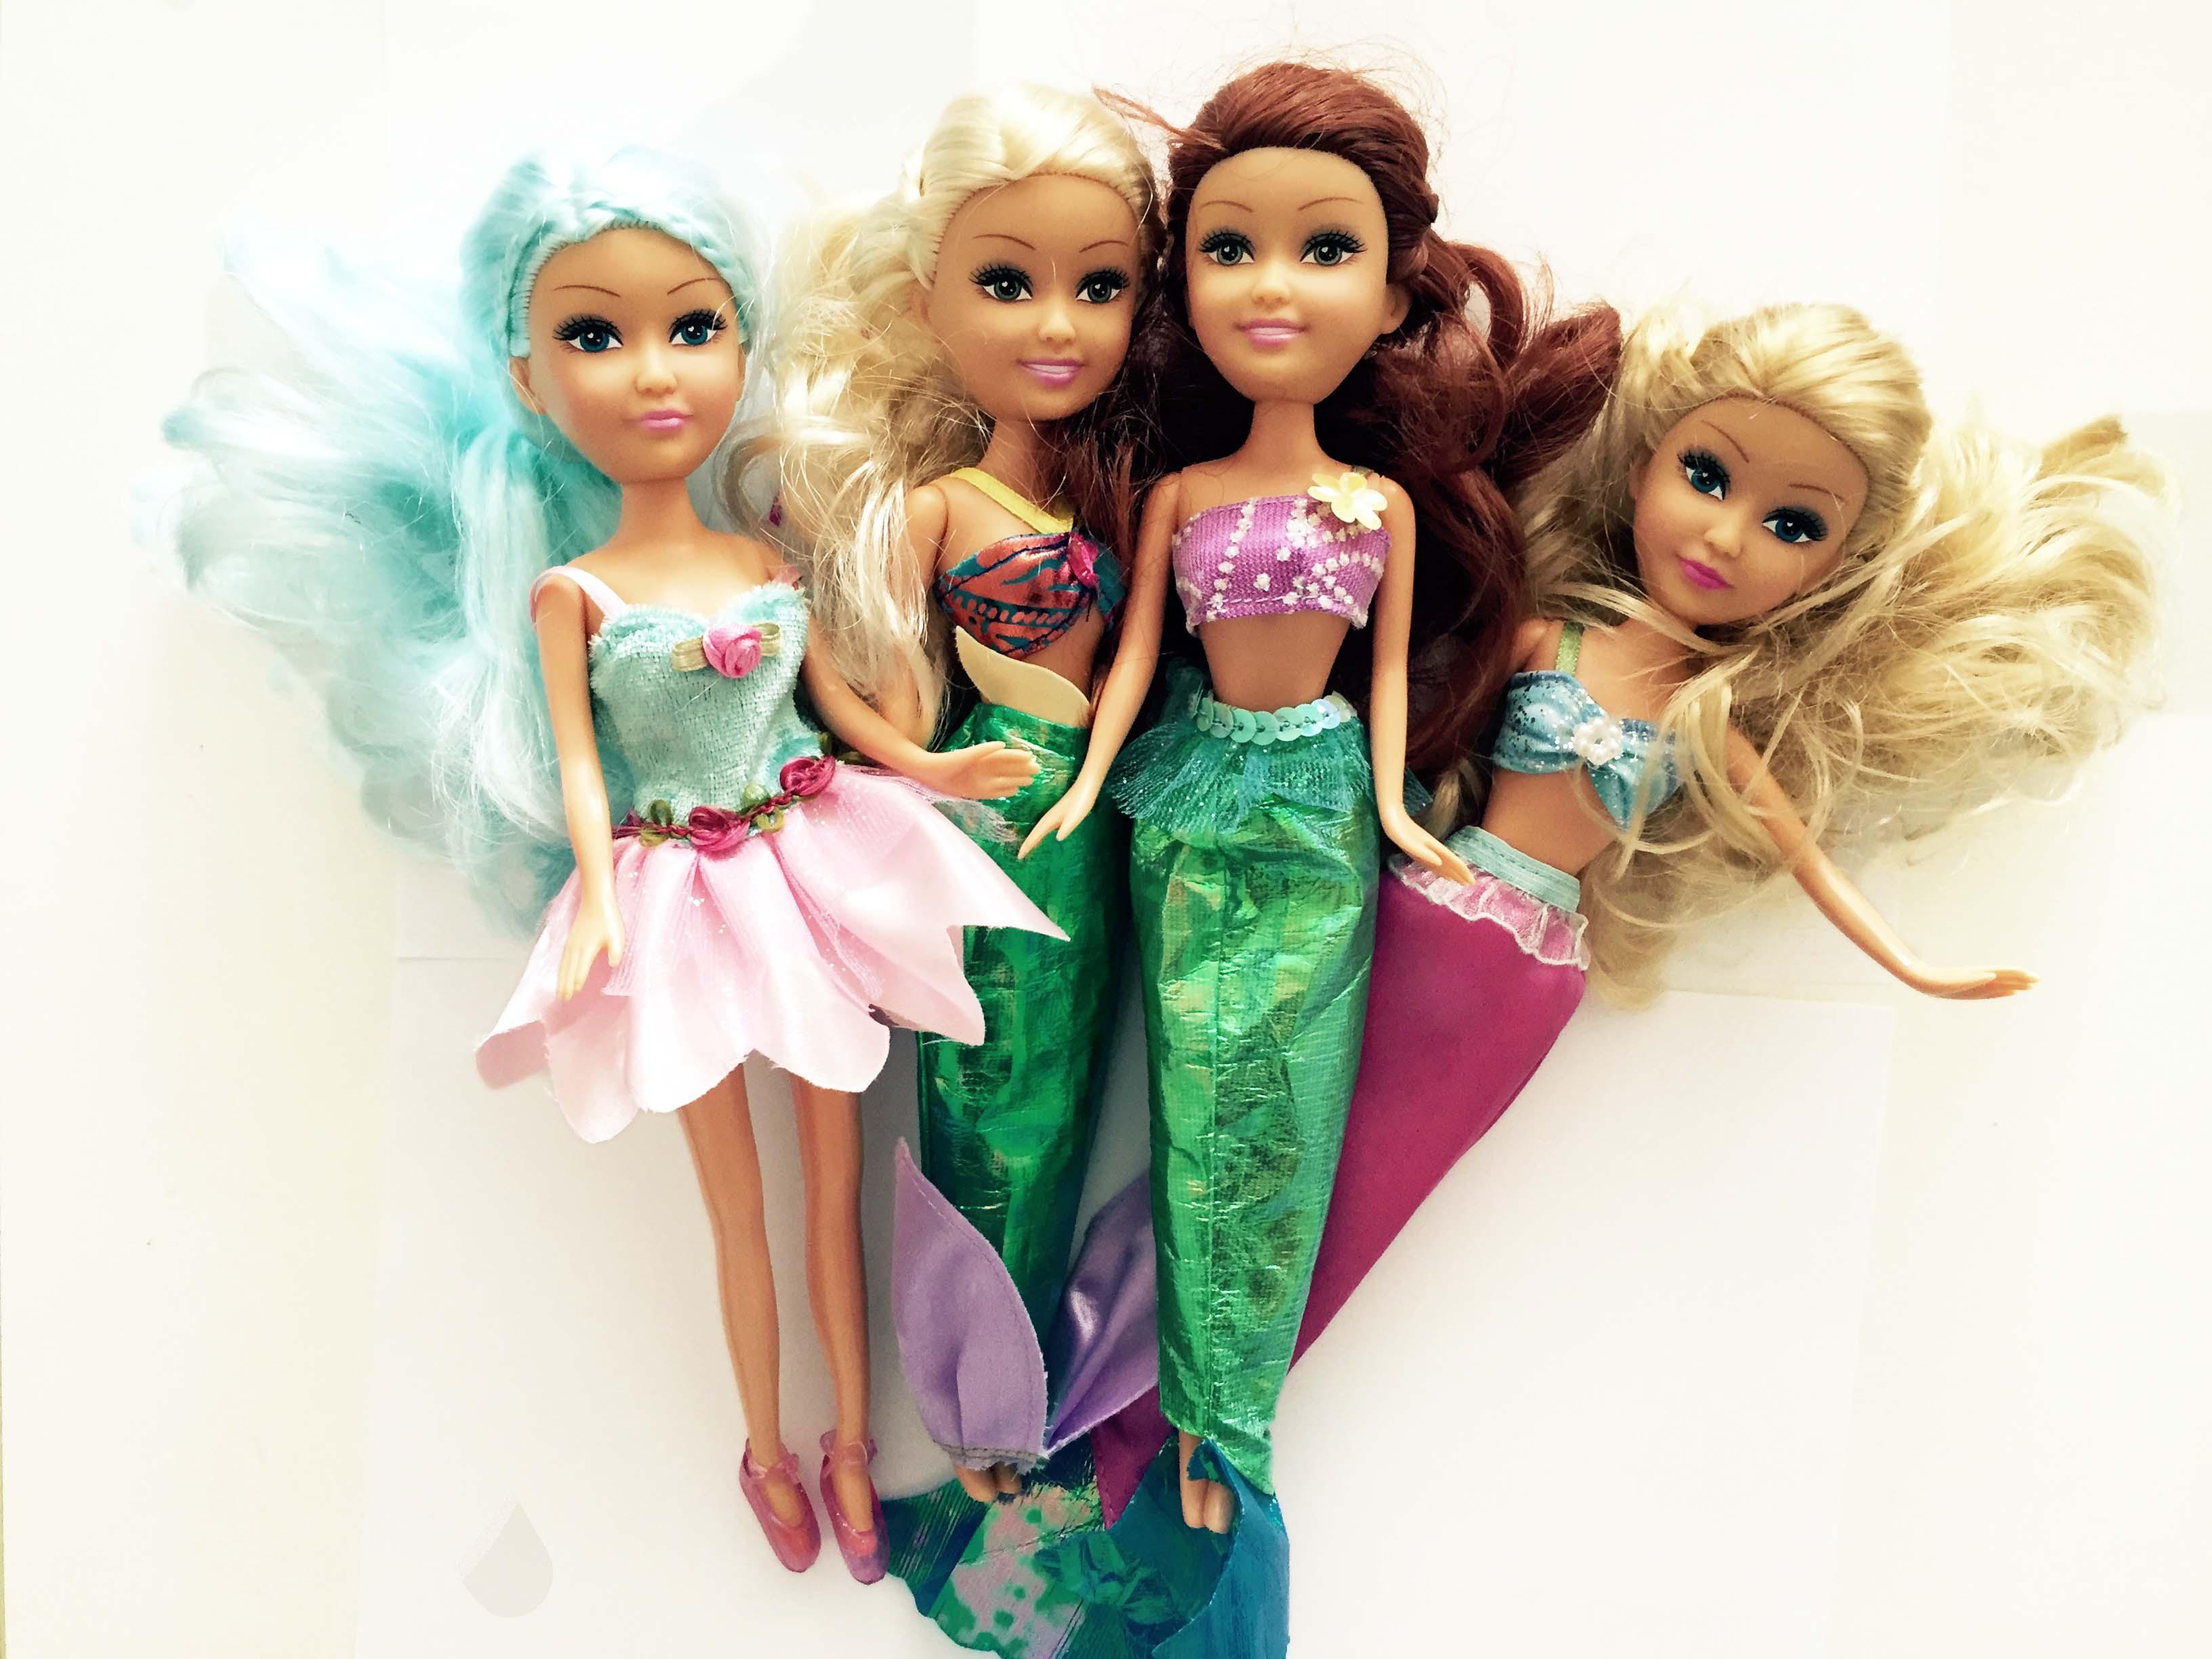 0280: Sparkle Girls Mermaid Dolls